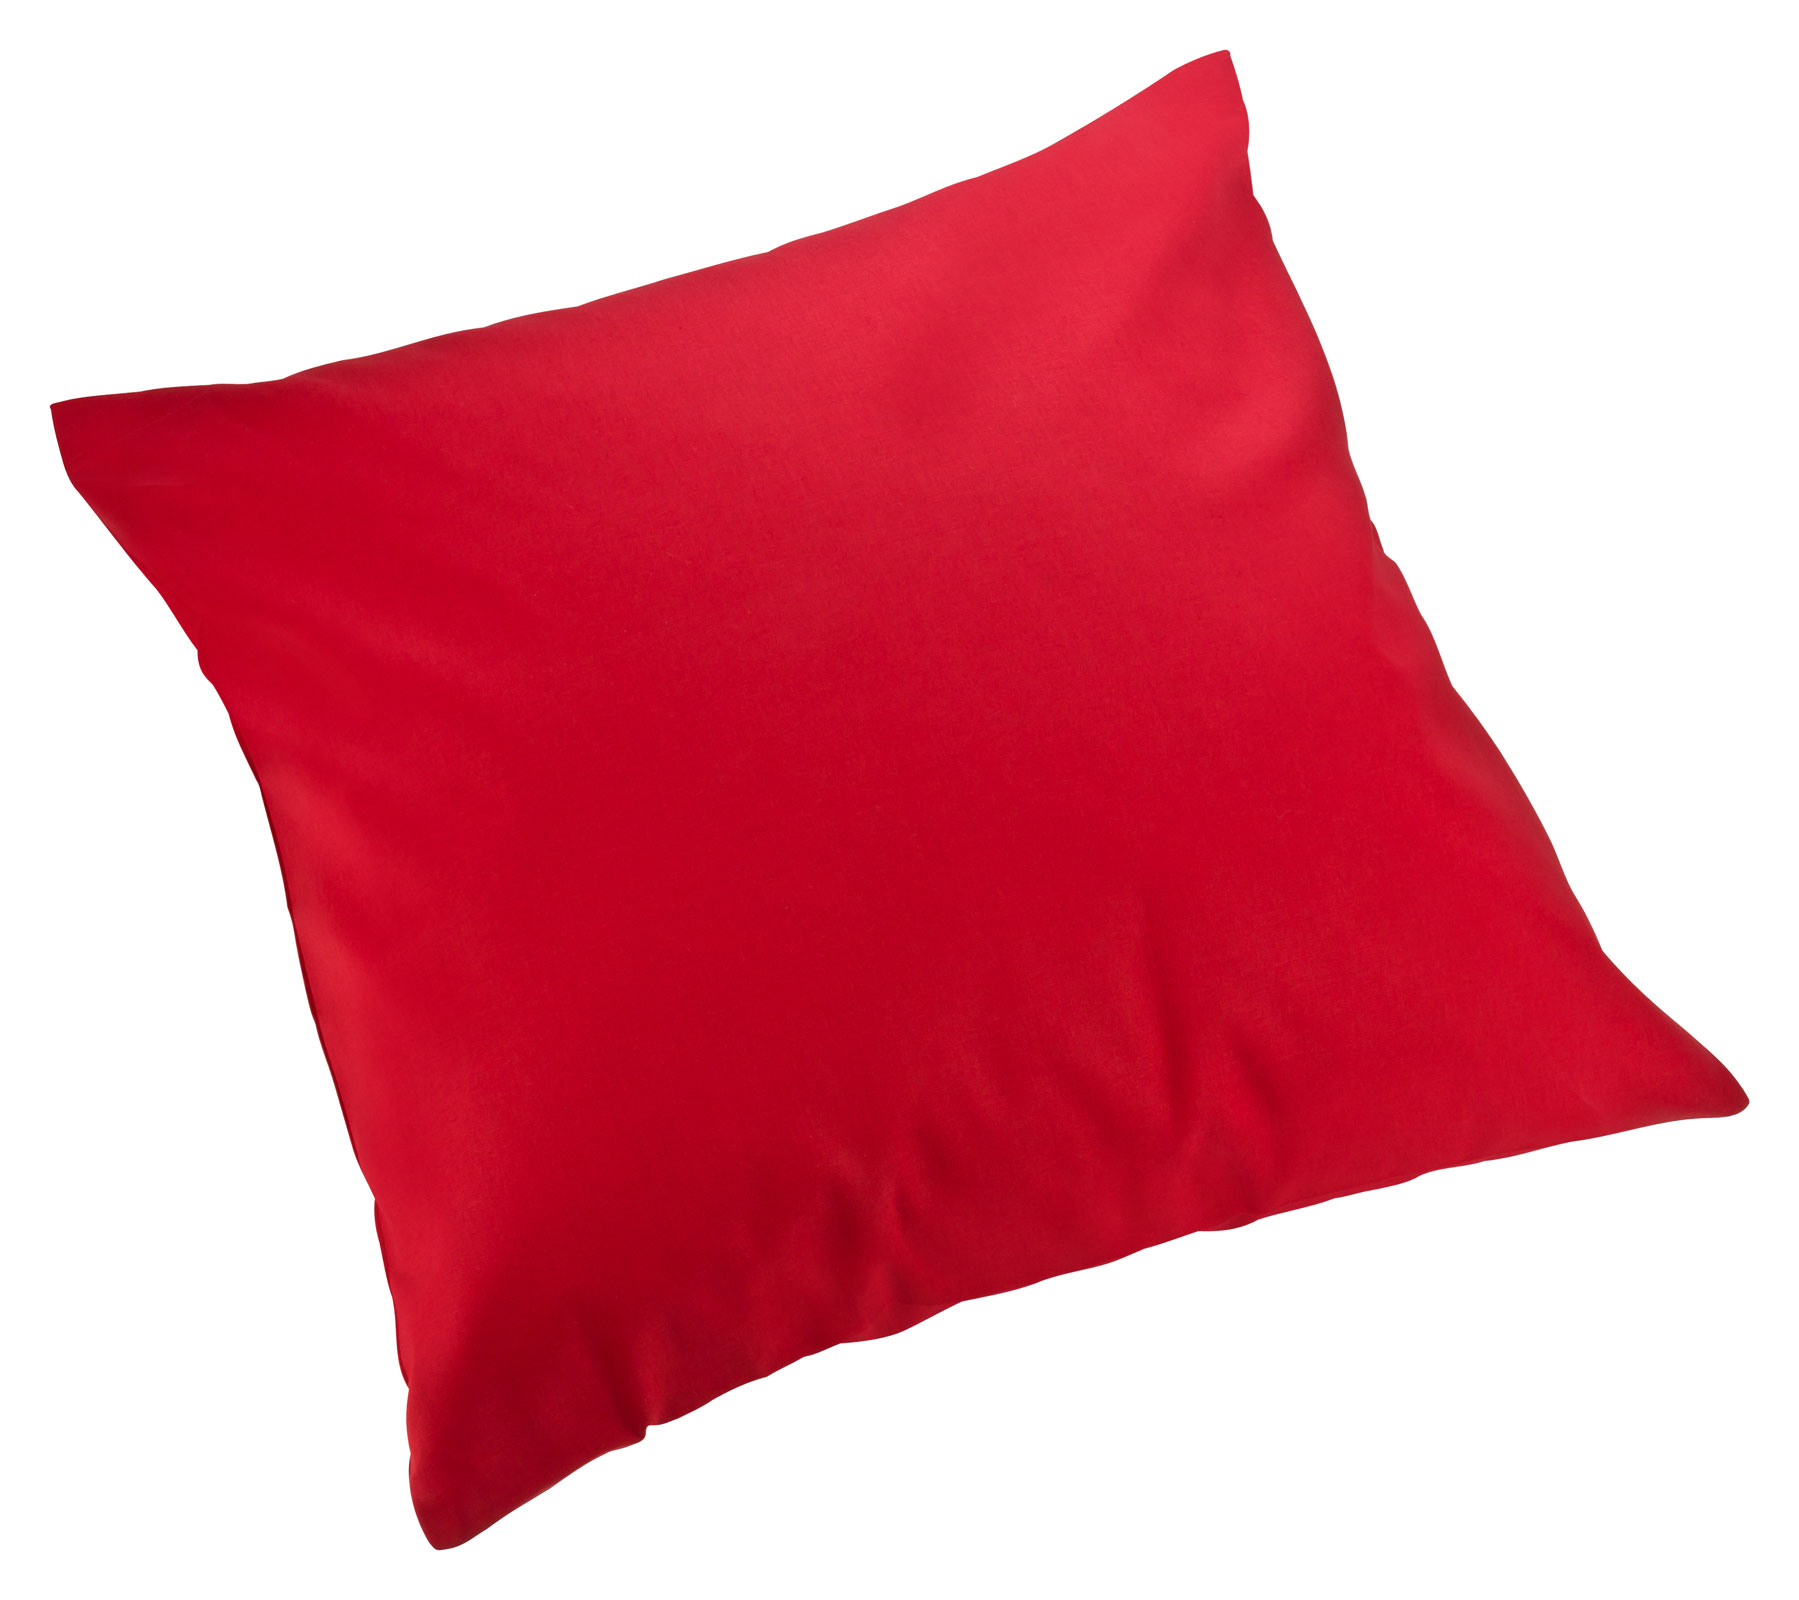 kissenbezug kissenh lle moon renforce 100 baumwolle rei verschluss kissen h lle. Black Bedroom Furniture Sets. Home Design Ideas